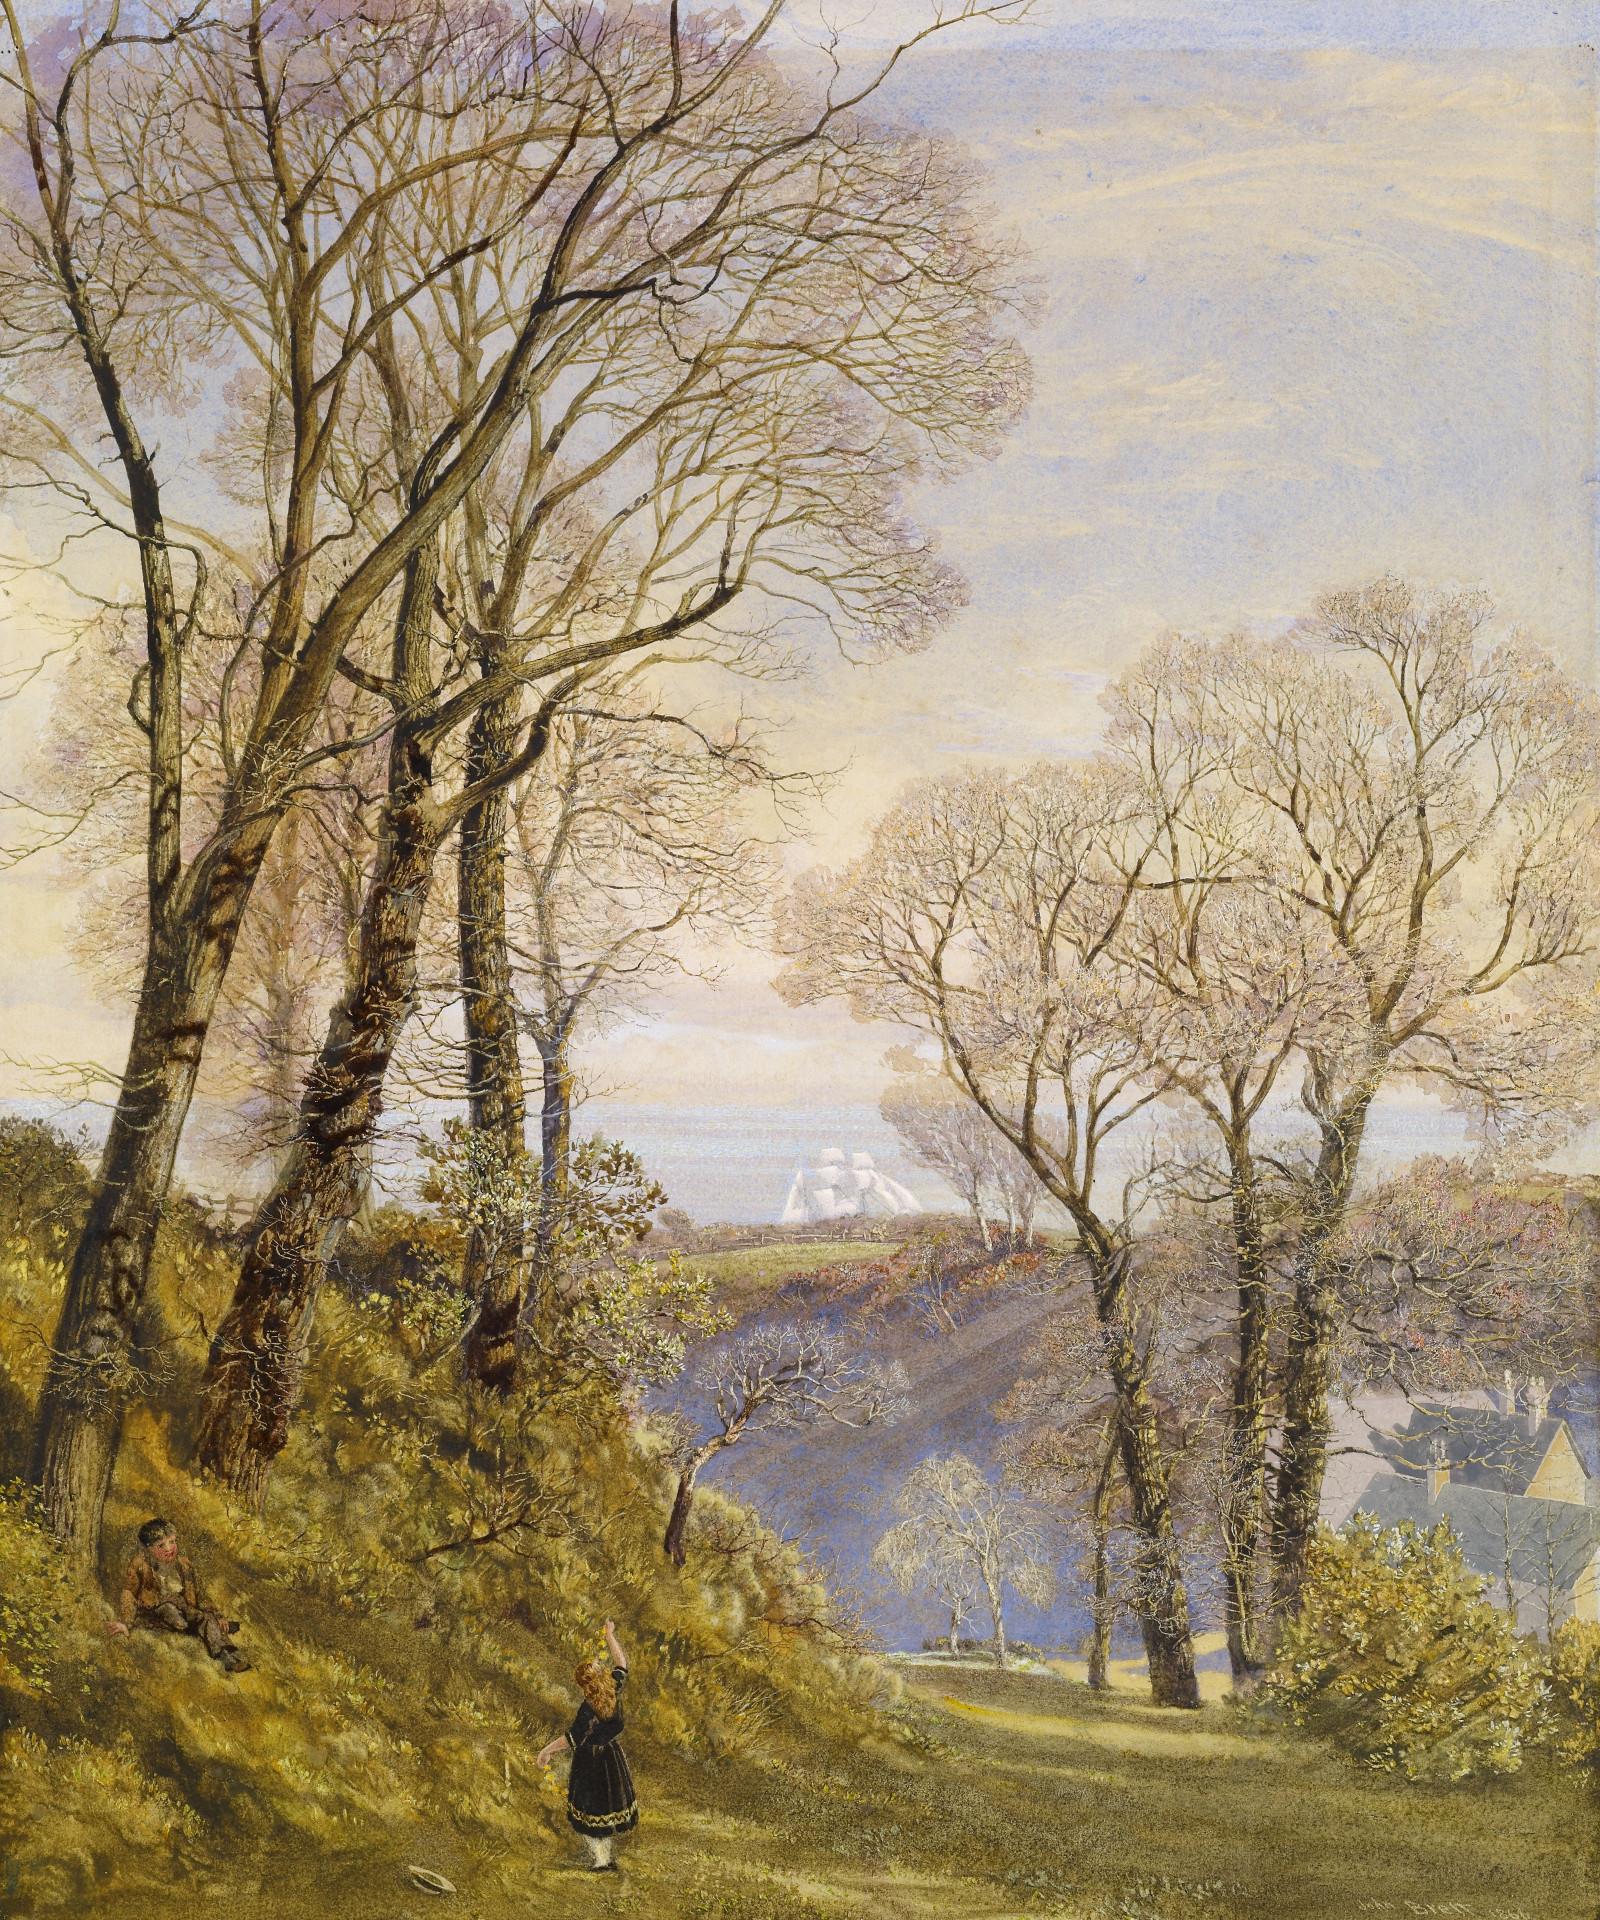 John Brett - February in the Isle of Wight, 1866